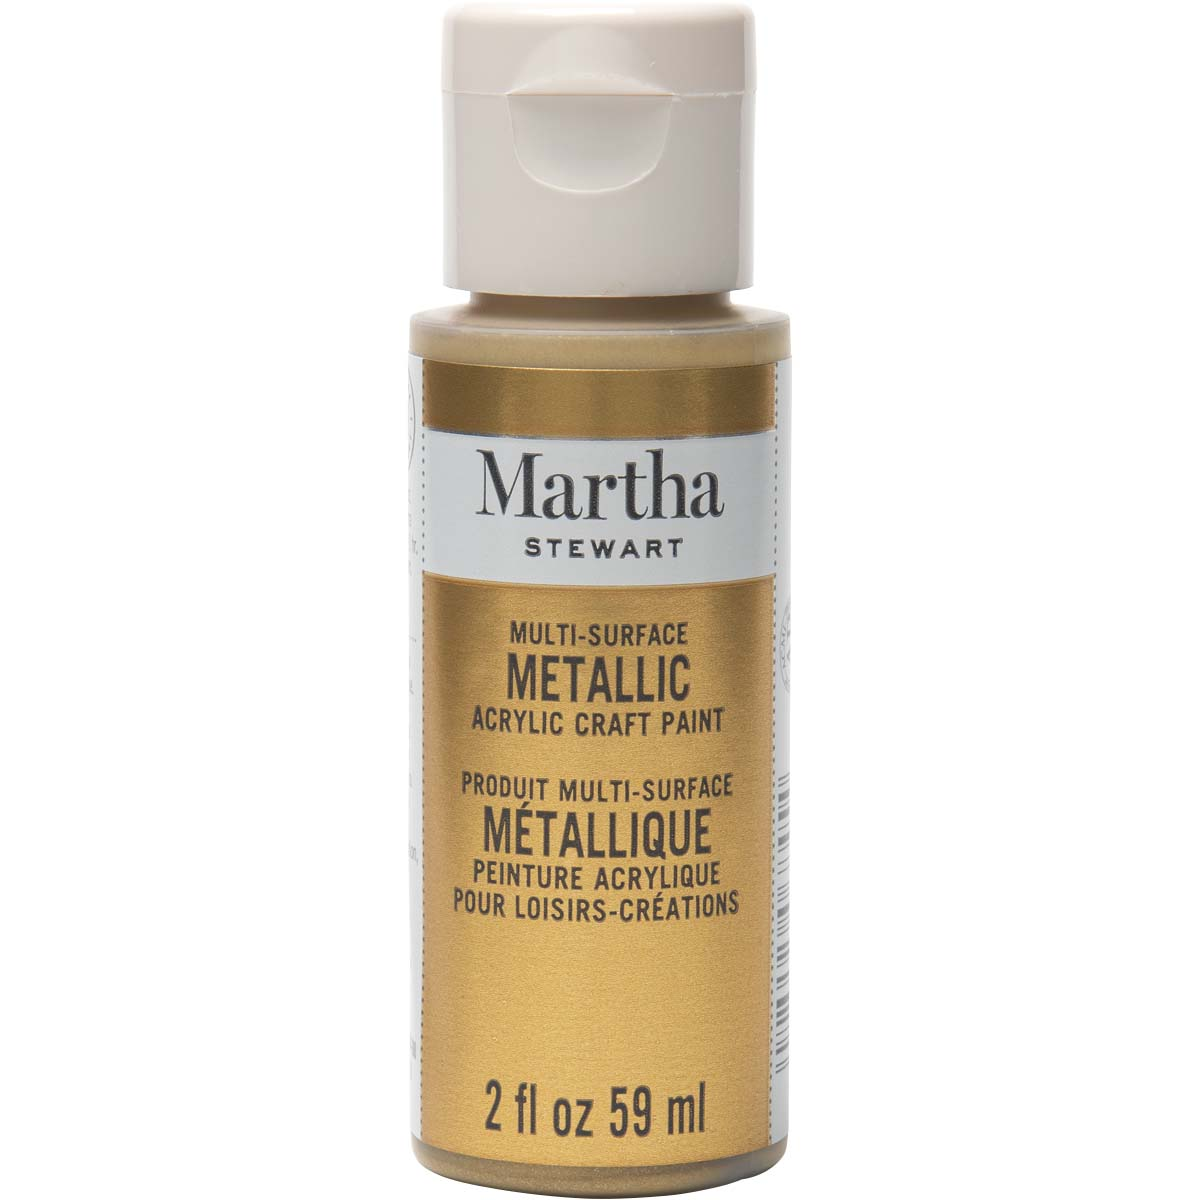 Martha Stewart ® Multi-Surface Metallic Acrylic Craft Paint - Gold, 2 oz.